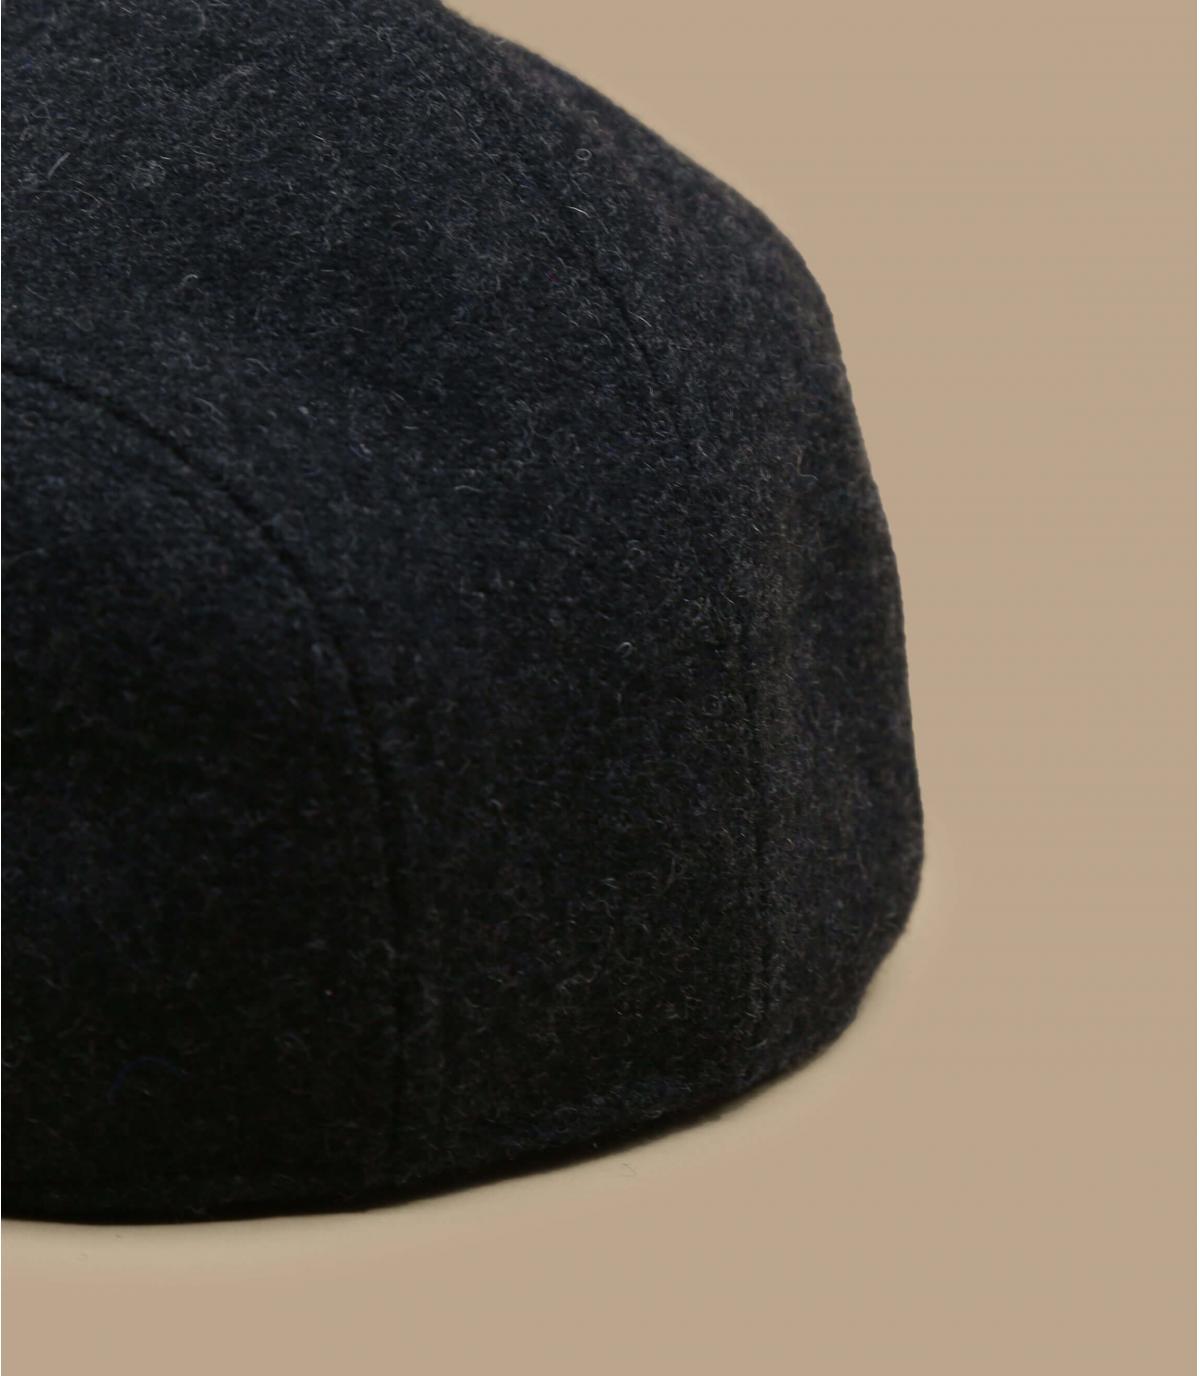 Dettagli Bertrand CNU Caban anthracite - image 3